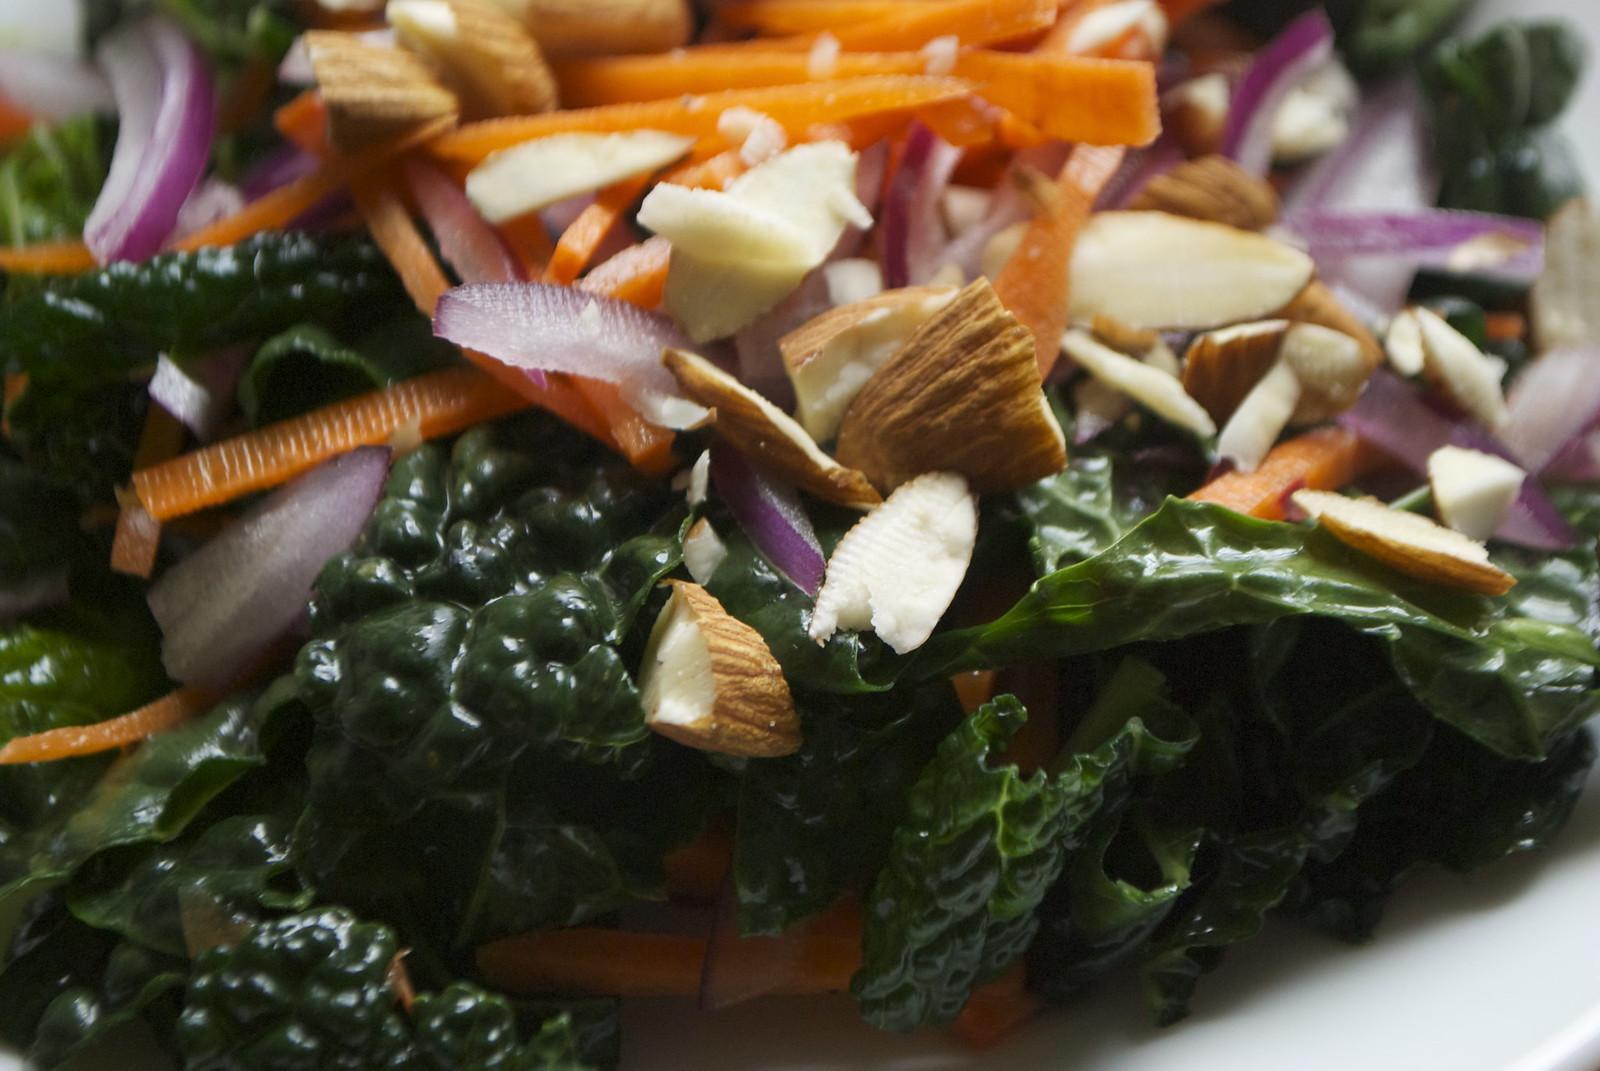 Kale Carrot Salad with Orange Vinaigrette | Kitchen in the Hills